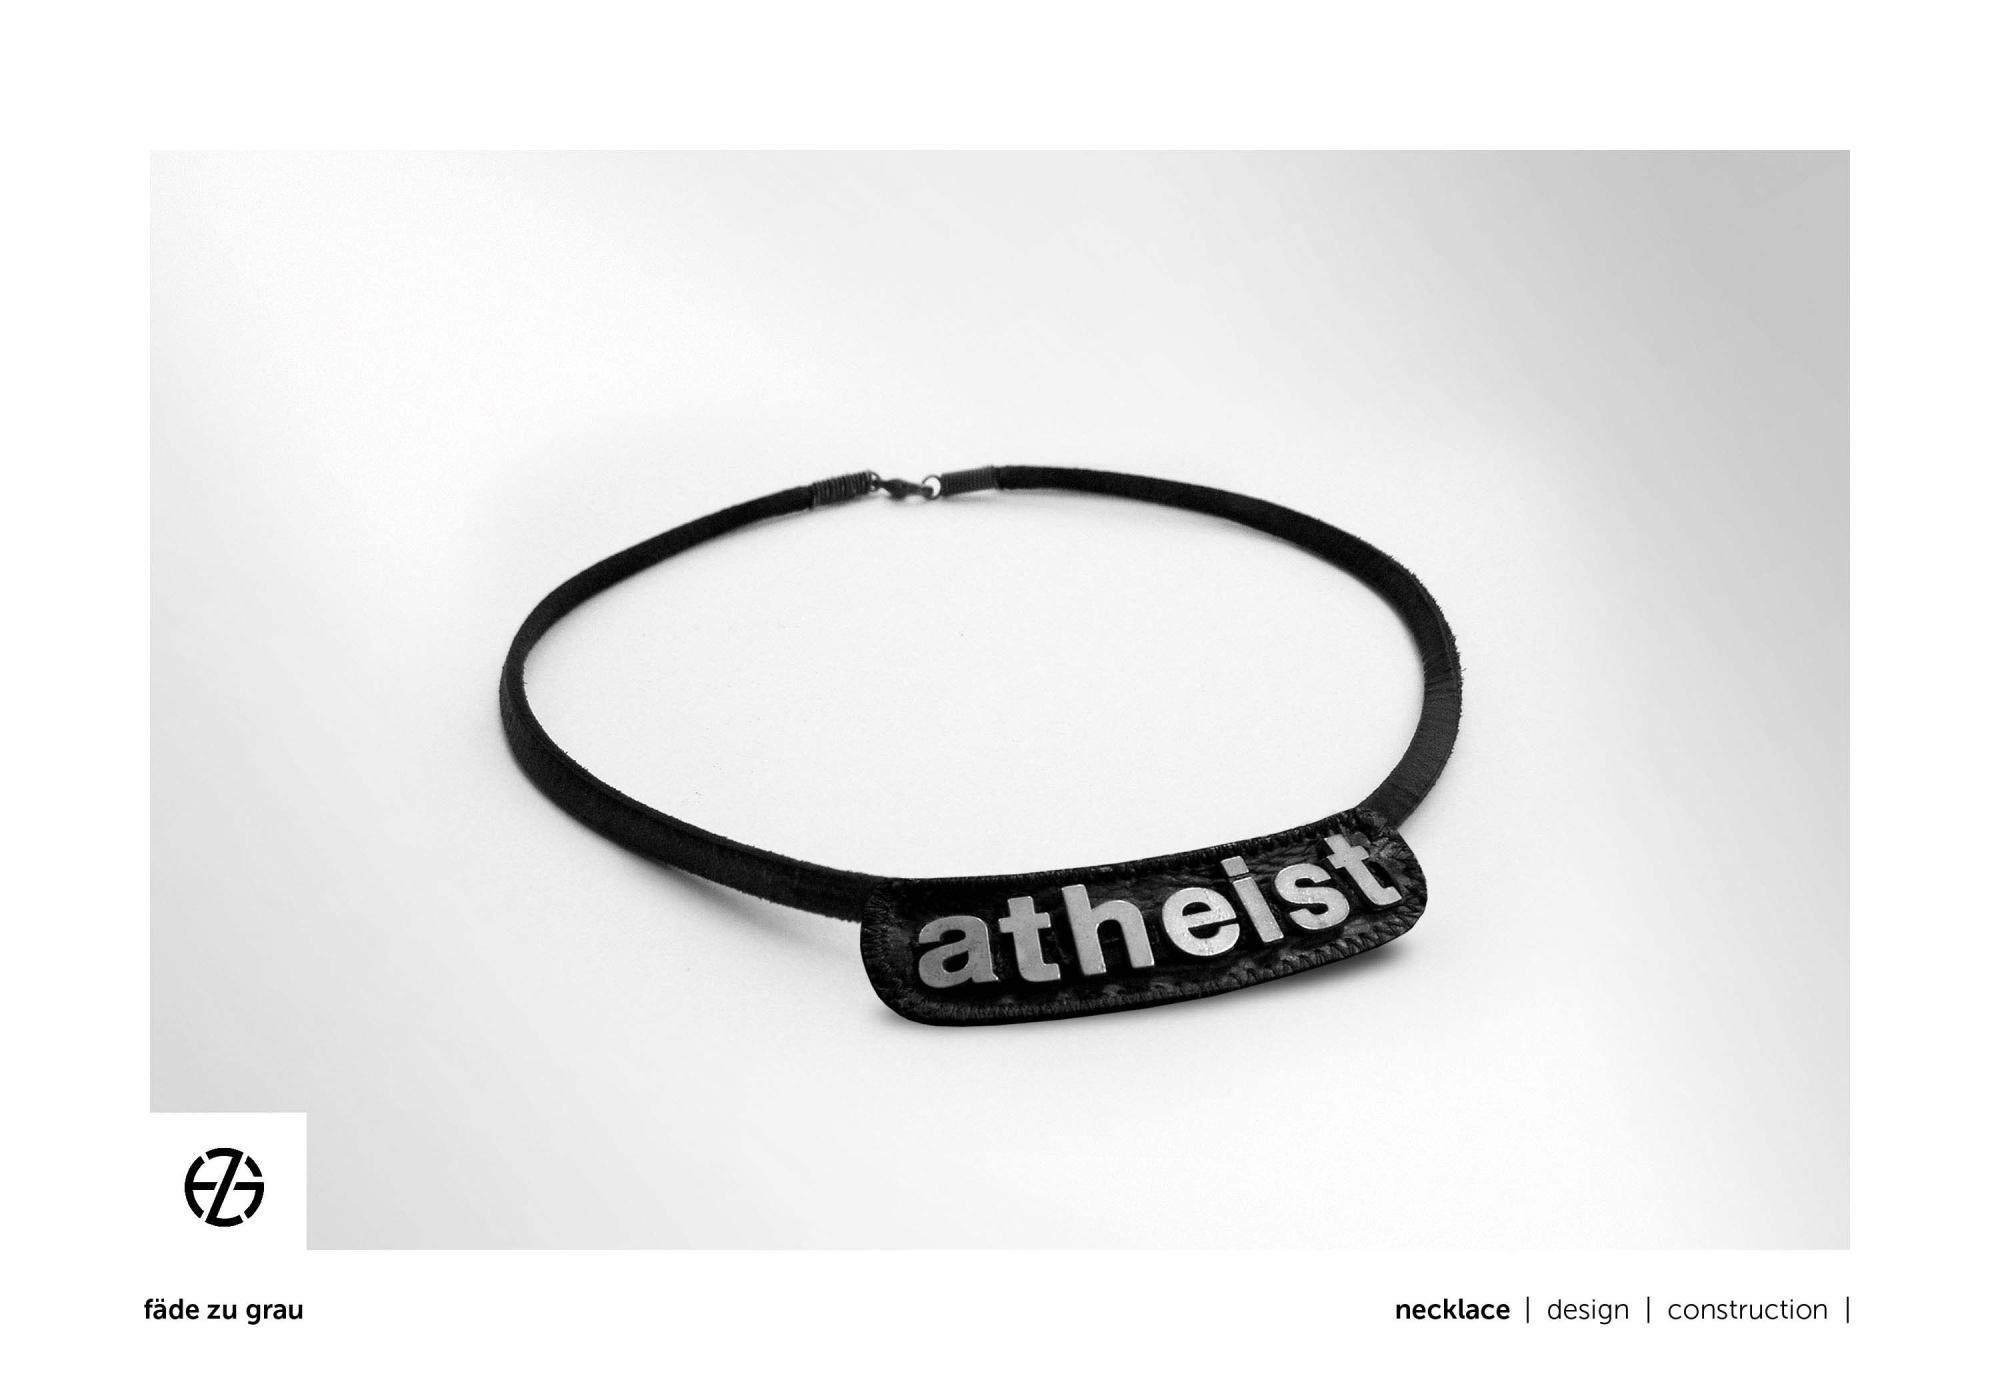 fäde zu grau | necklace 'atheist'